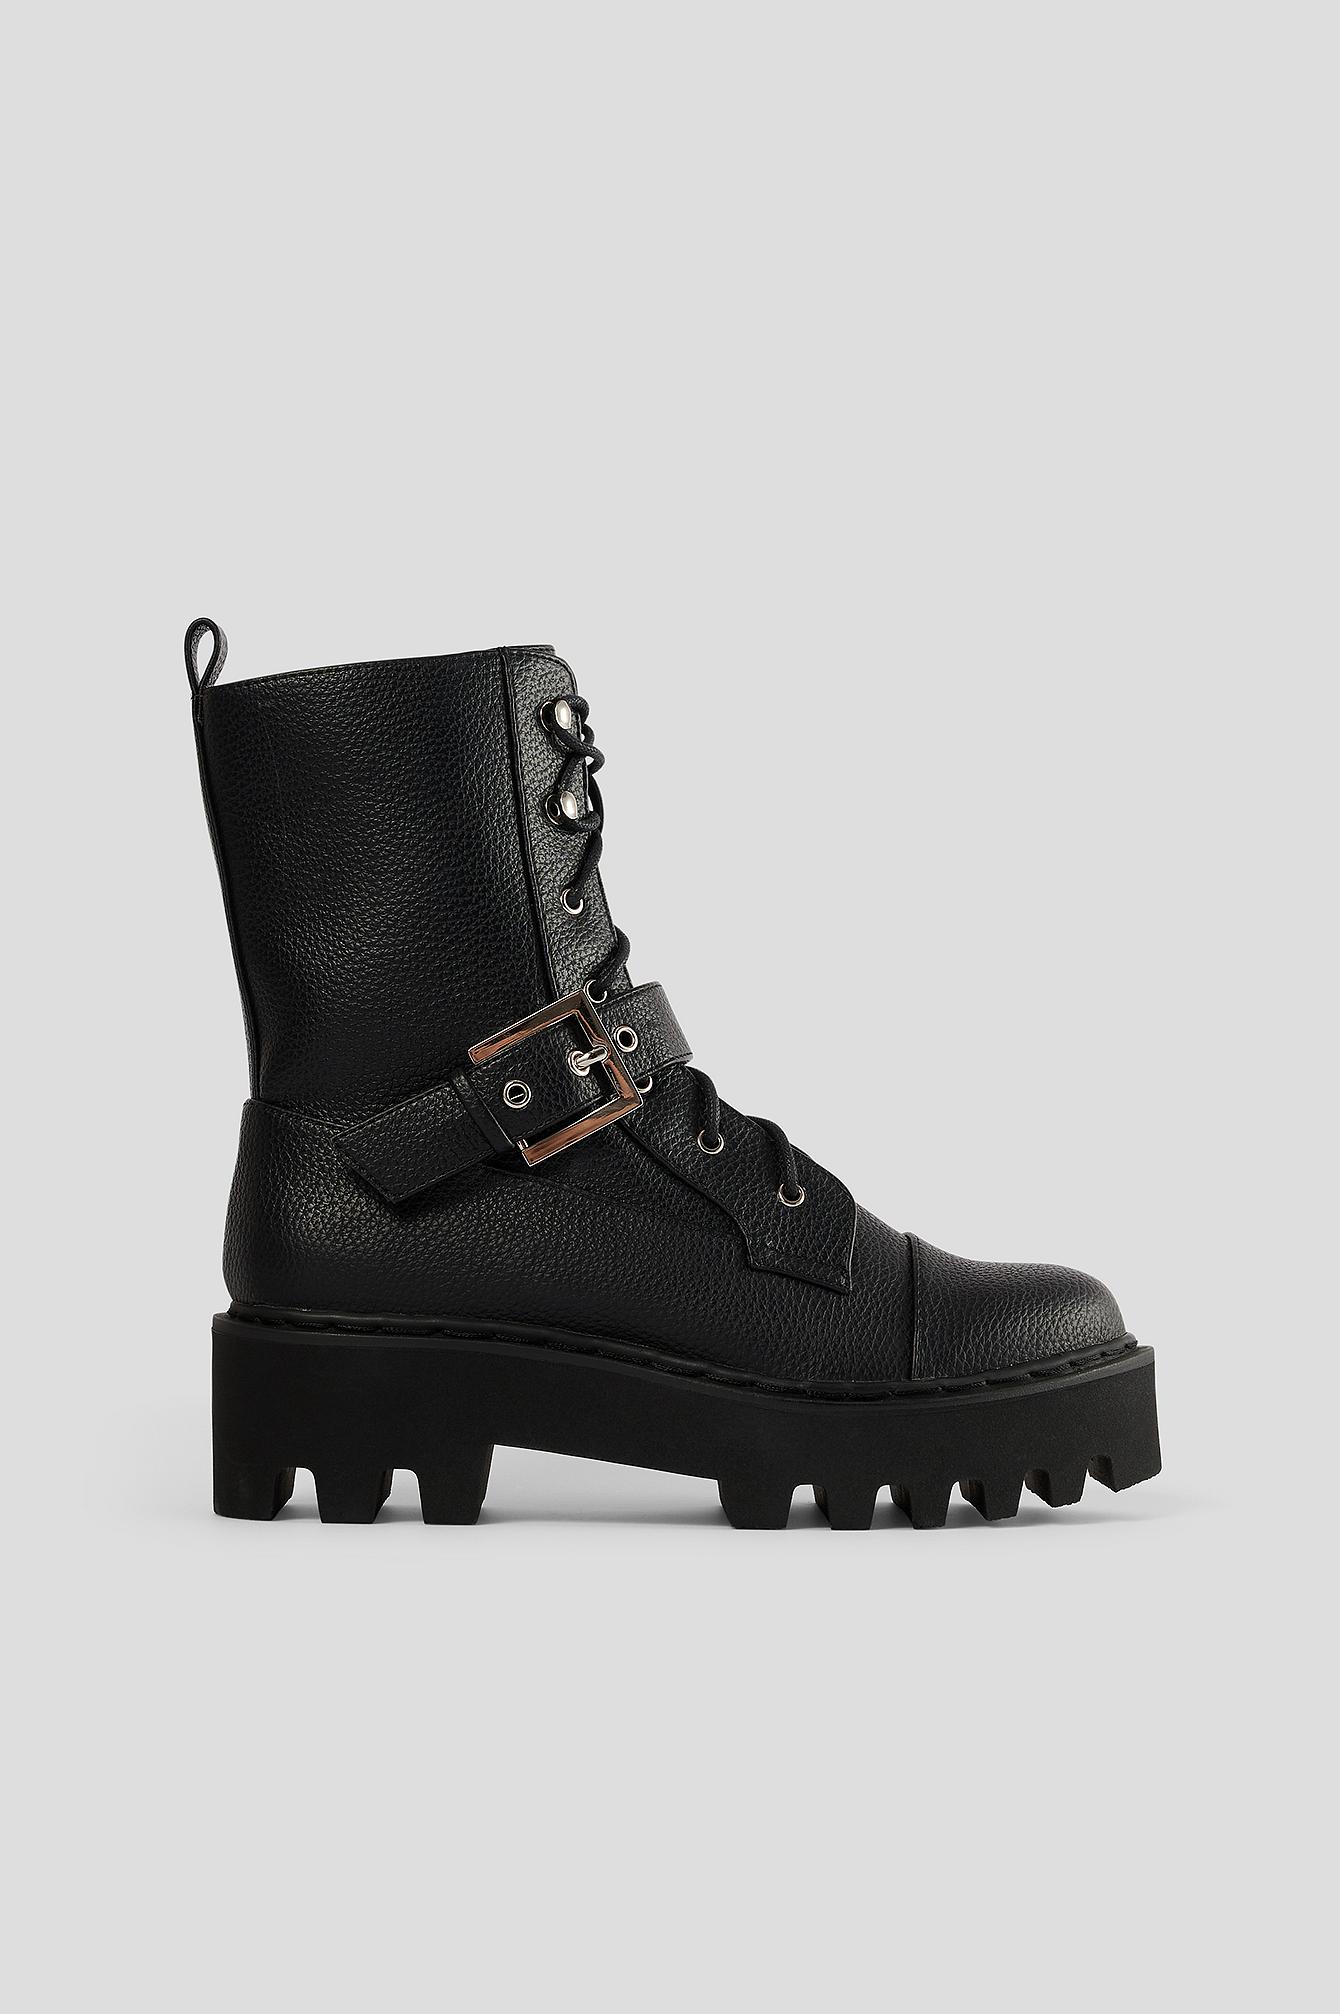 na-kd shoes -  Kampfstiefel Mit Schnalle - Black